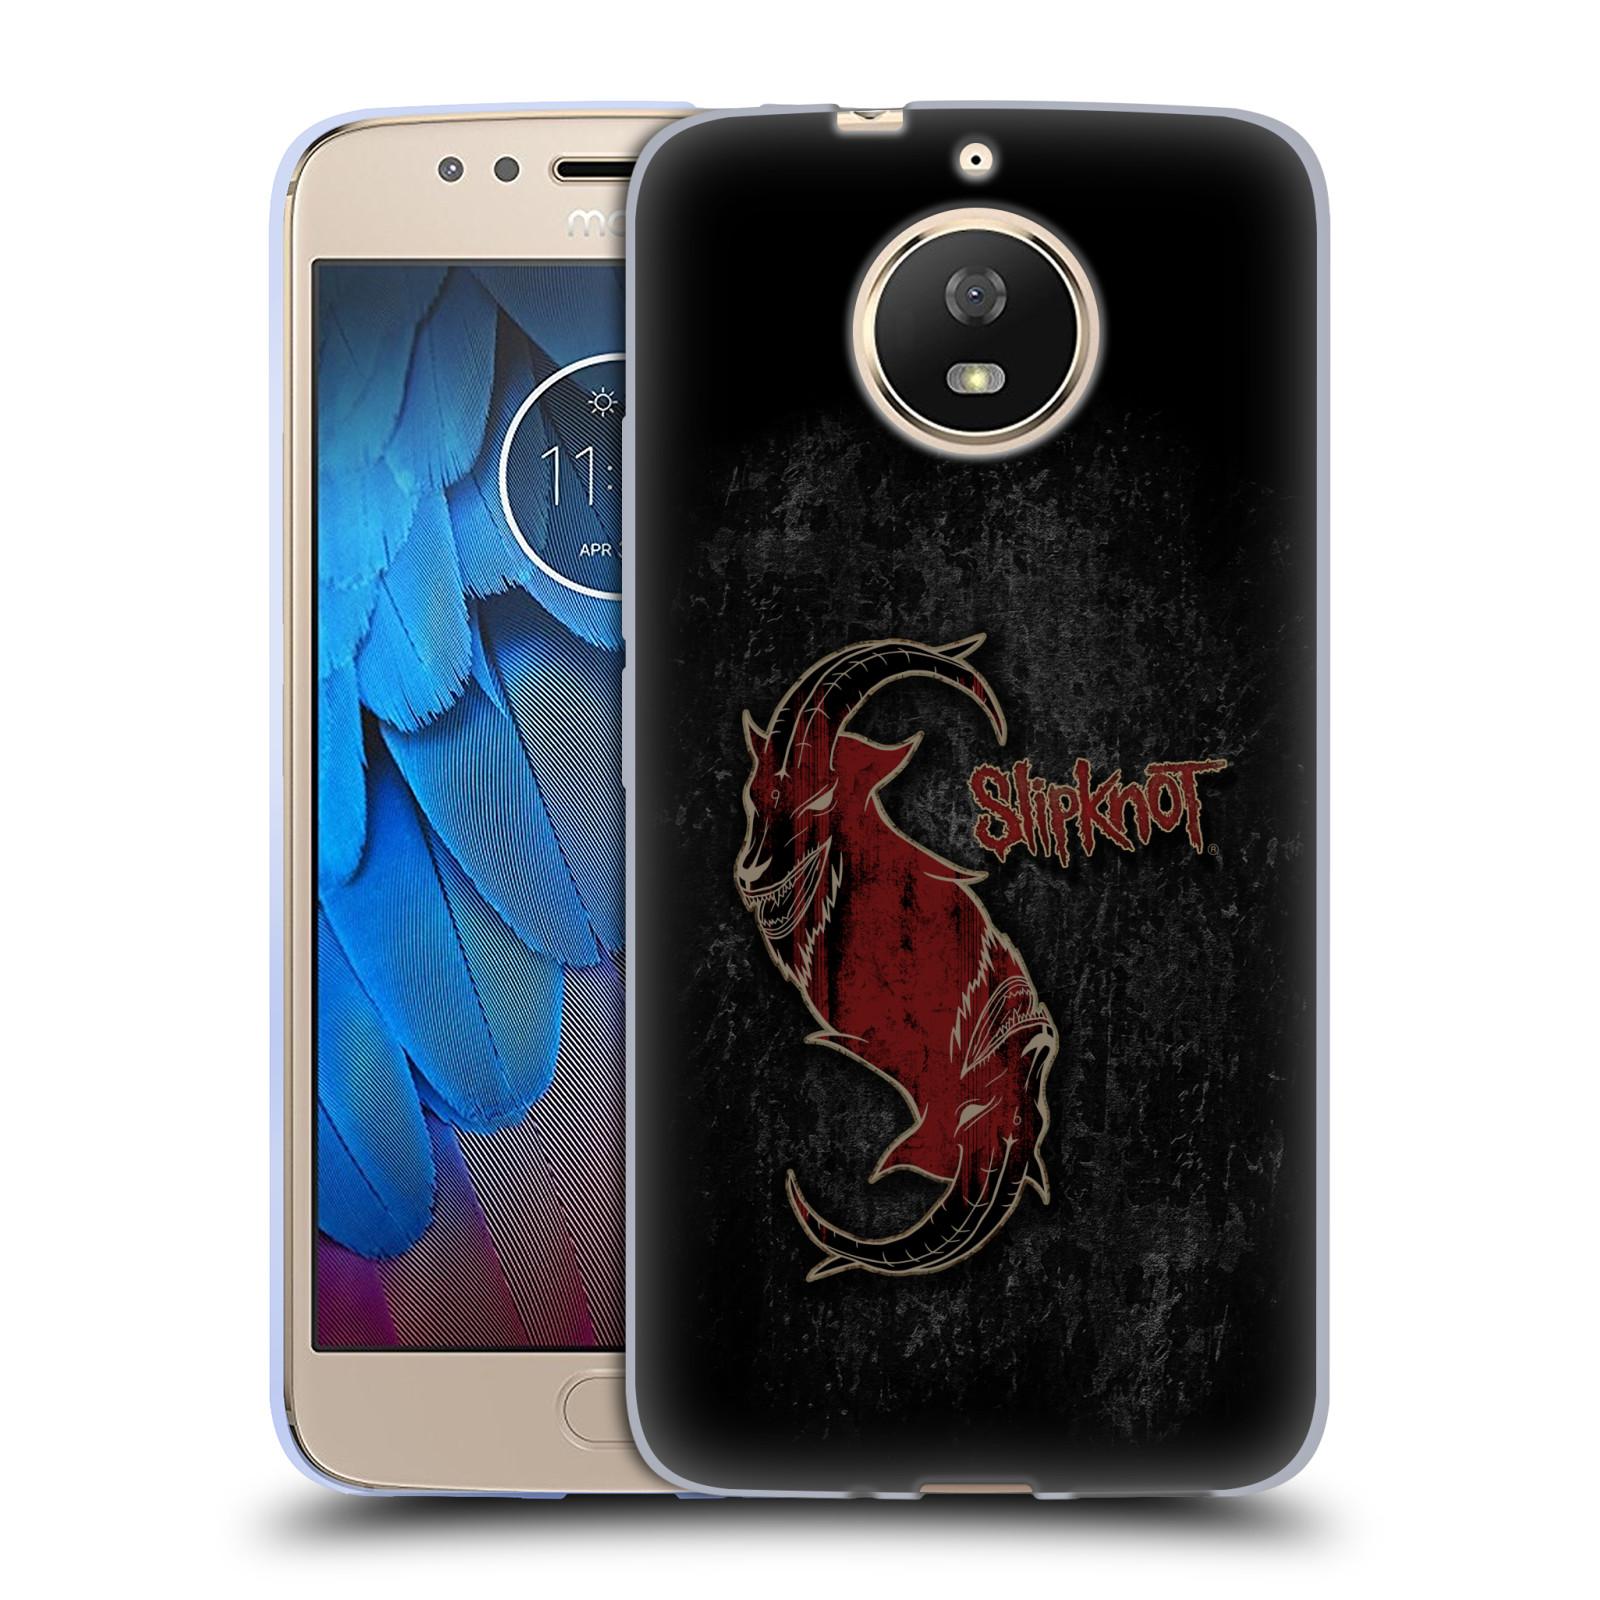 Silikonové pouzdro na mobil Lenovo Moto G5s - Head Case - Slipknot - Rudý kozel